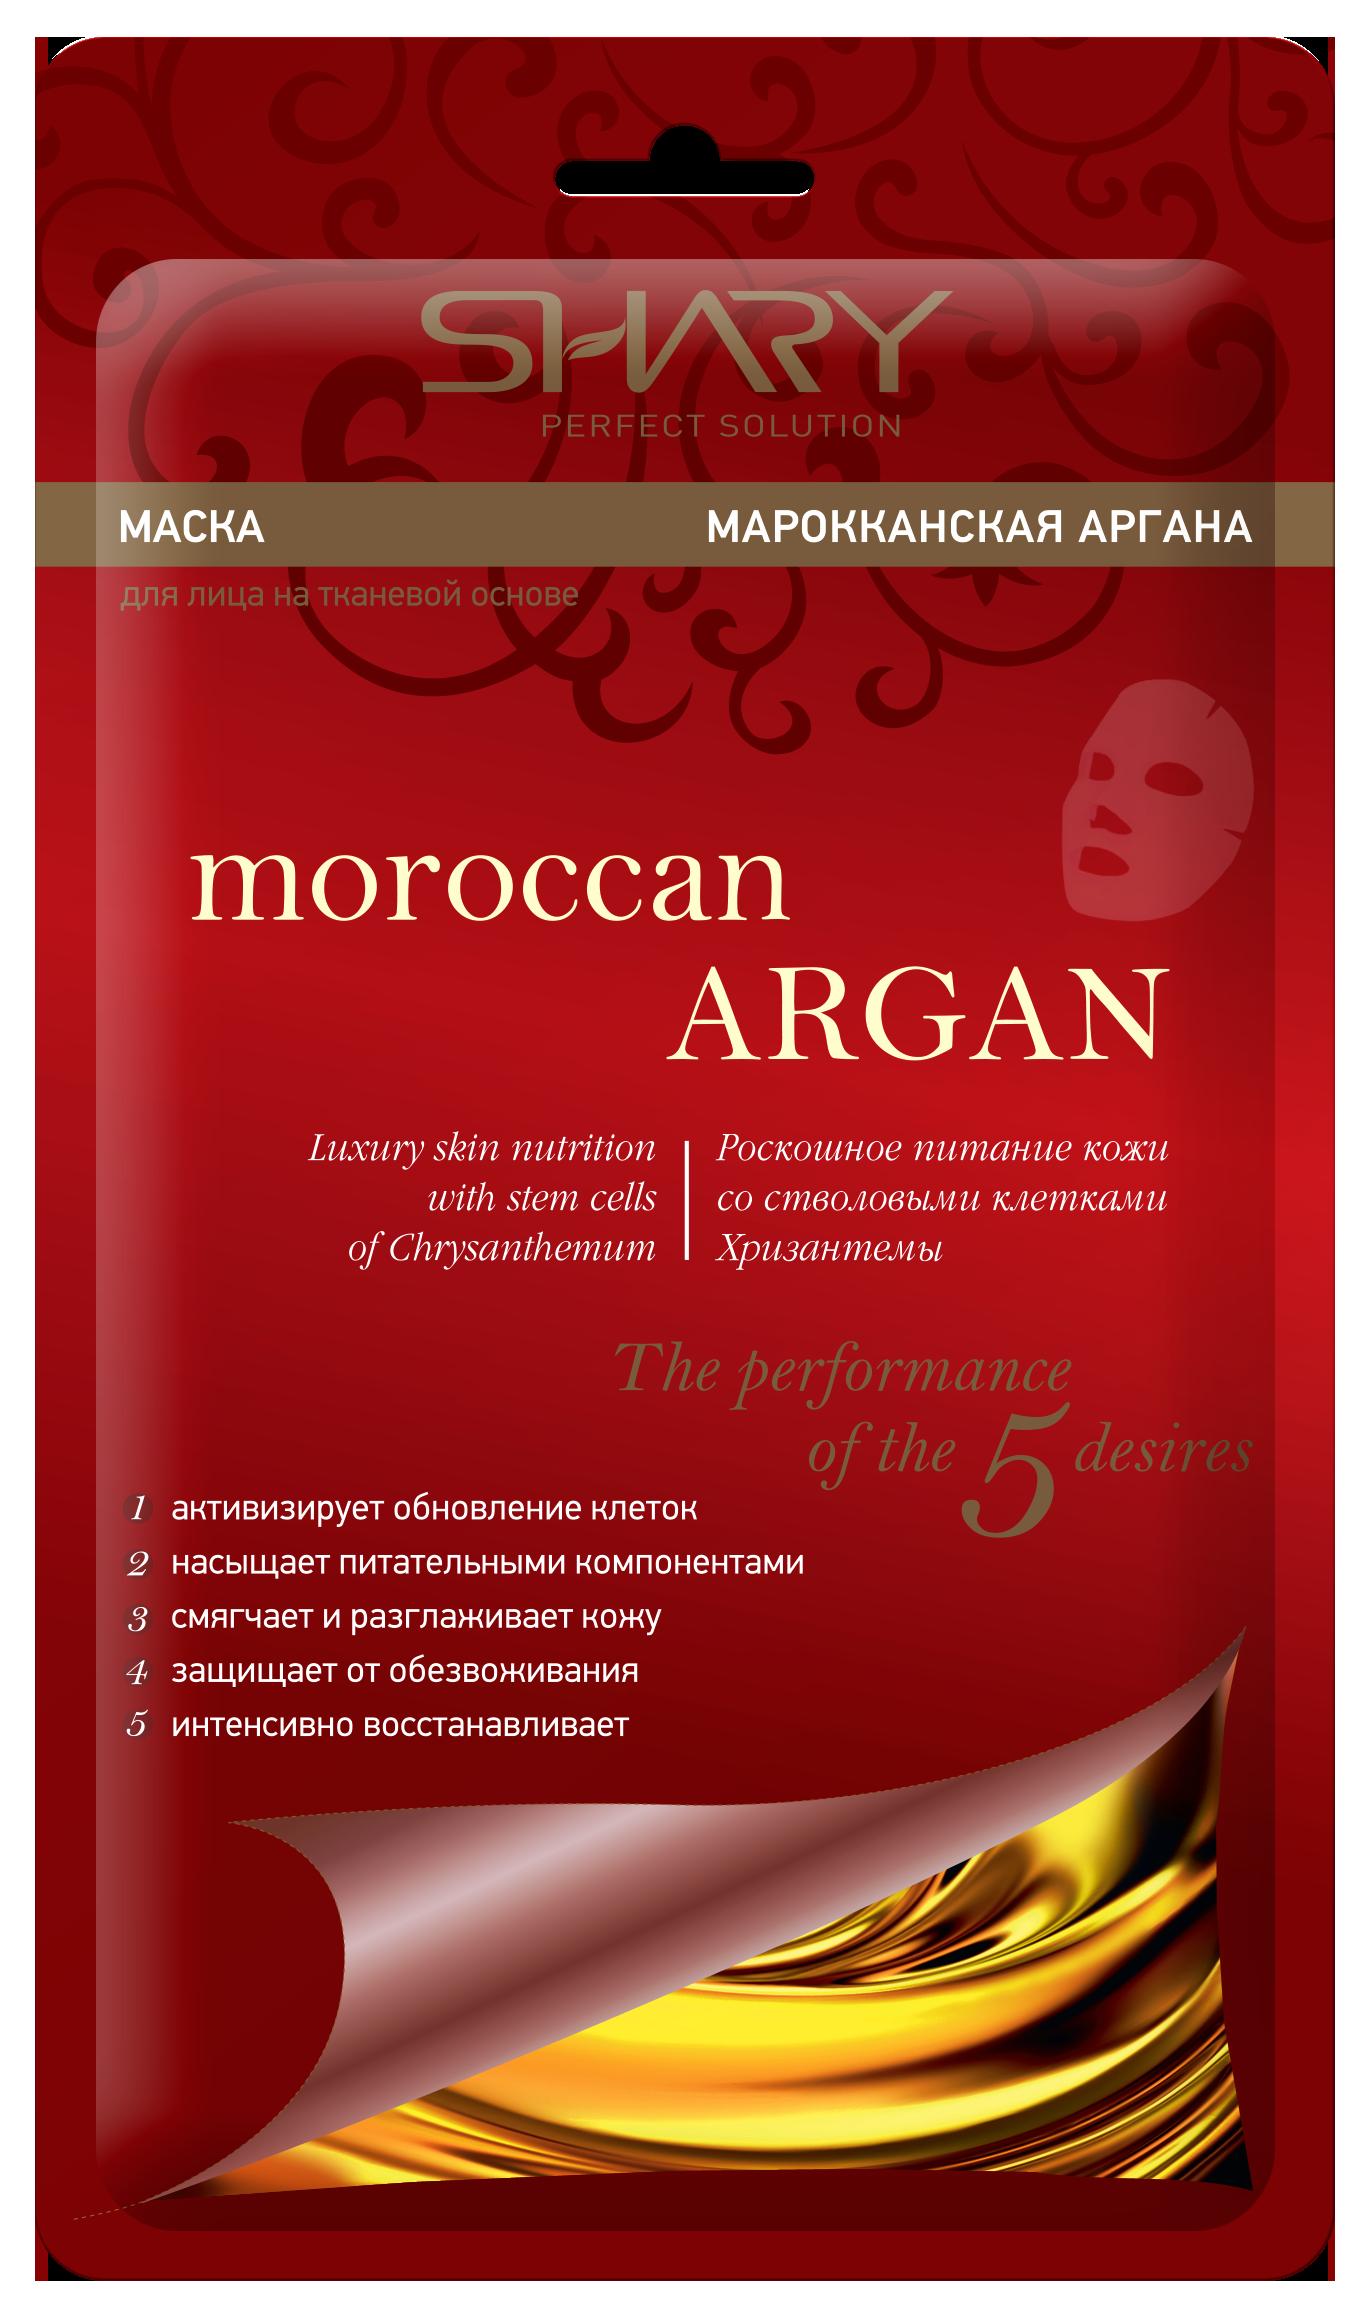 SHARY Маска для лица на тканевой основе Марокканская аргана / SHARY 20 гр